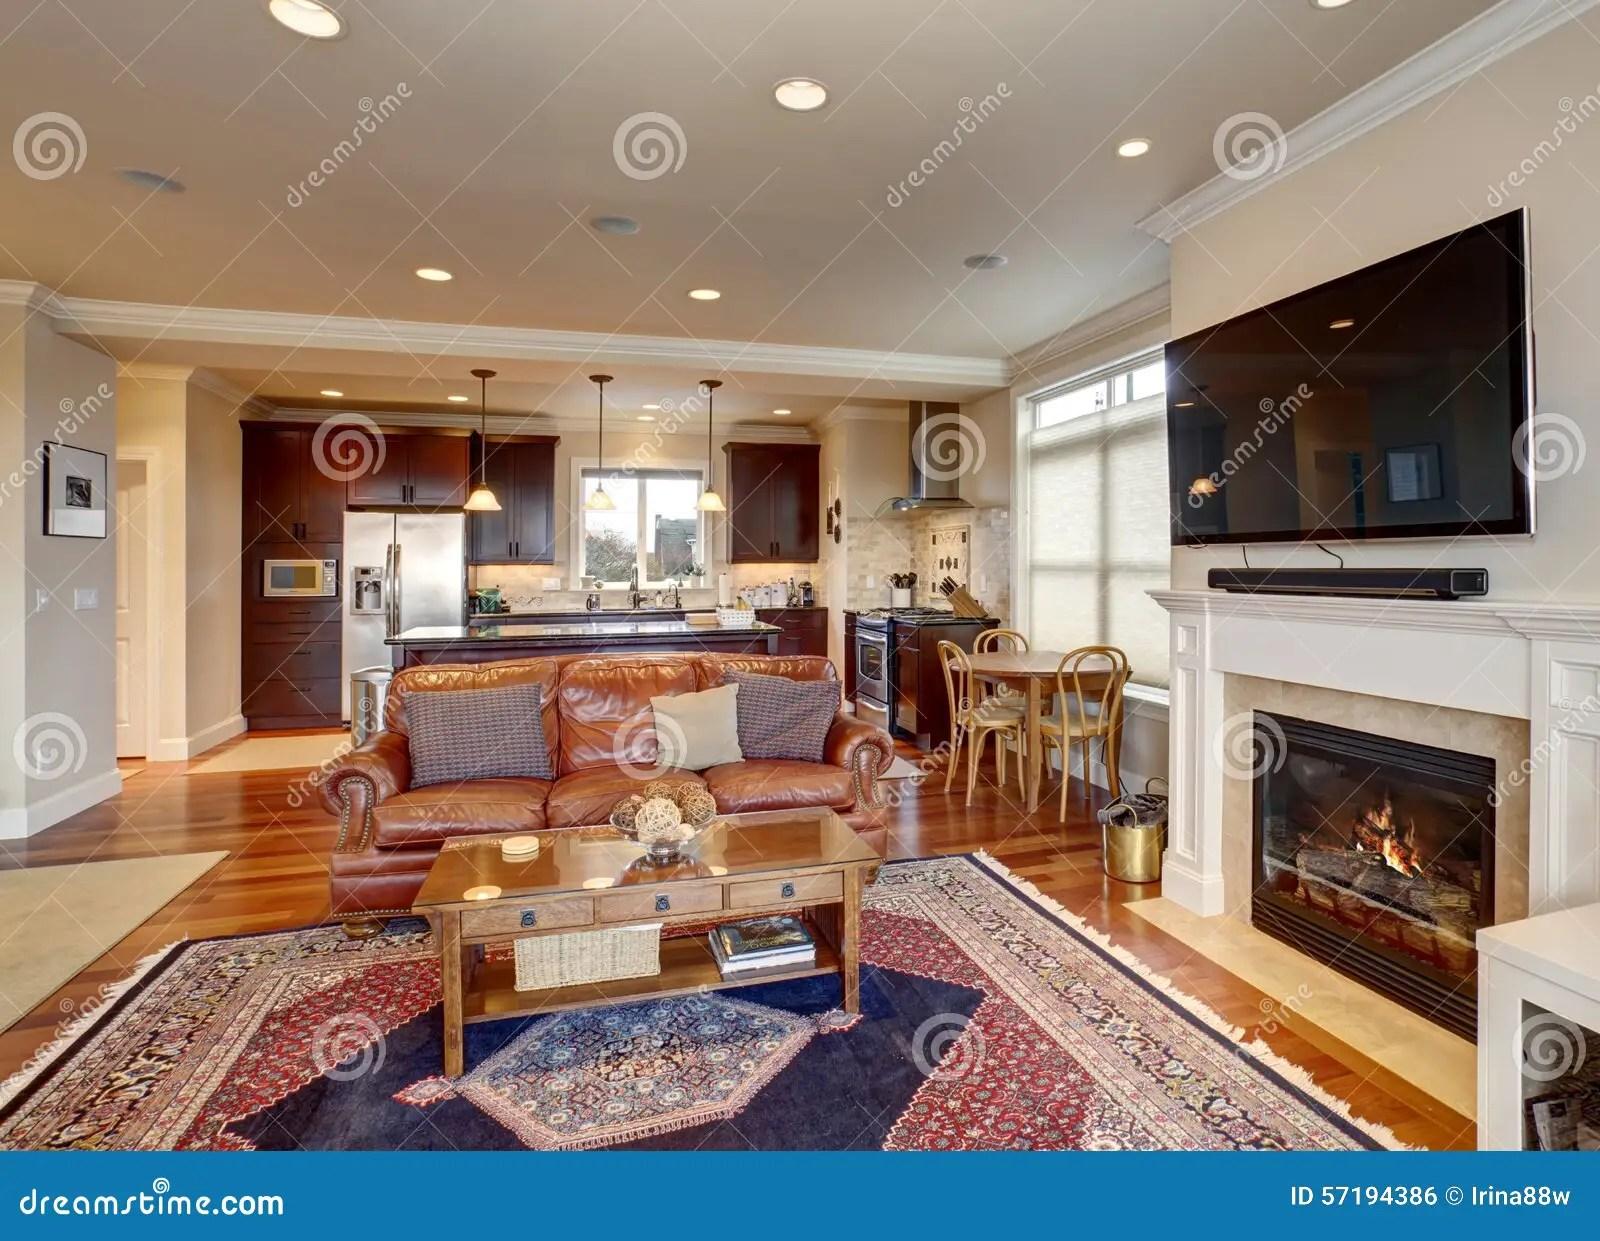 blue kitchen rugs sink bottom grid 有红色和蓝色地毯的豪华客厅库存照片 图片包括有长沙发 厨房 实际 有皮革长沙发的豪华客厅和壁炉